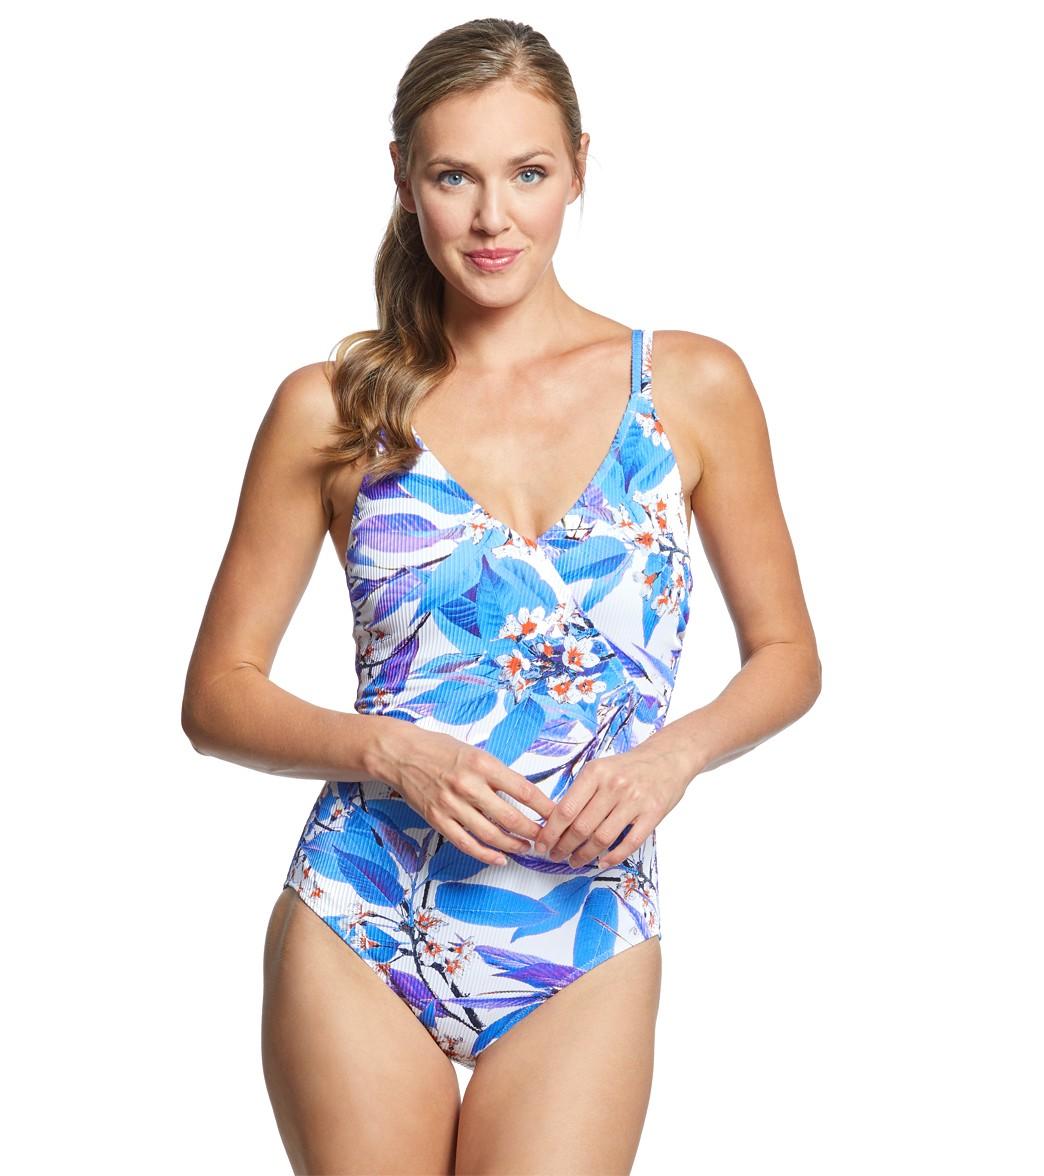 1e700fc61 Gottex Sakura Surplice One Piece Swimsuit (D Cup) at SwimOutlet.com ...